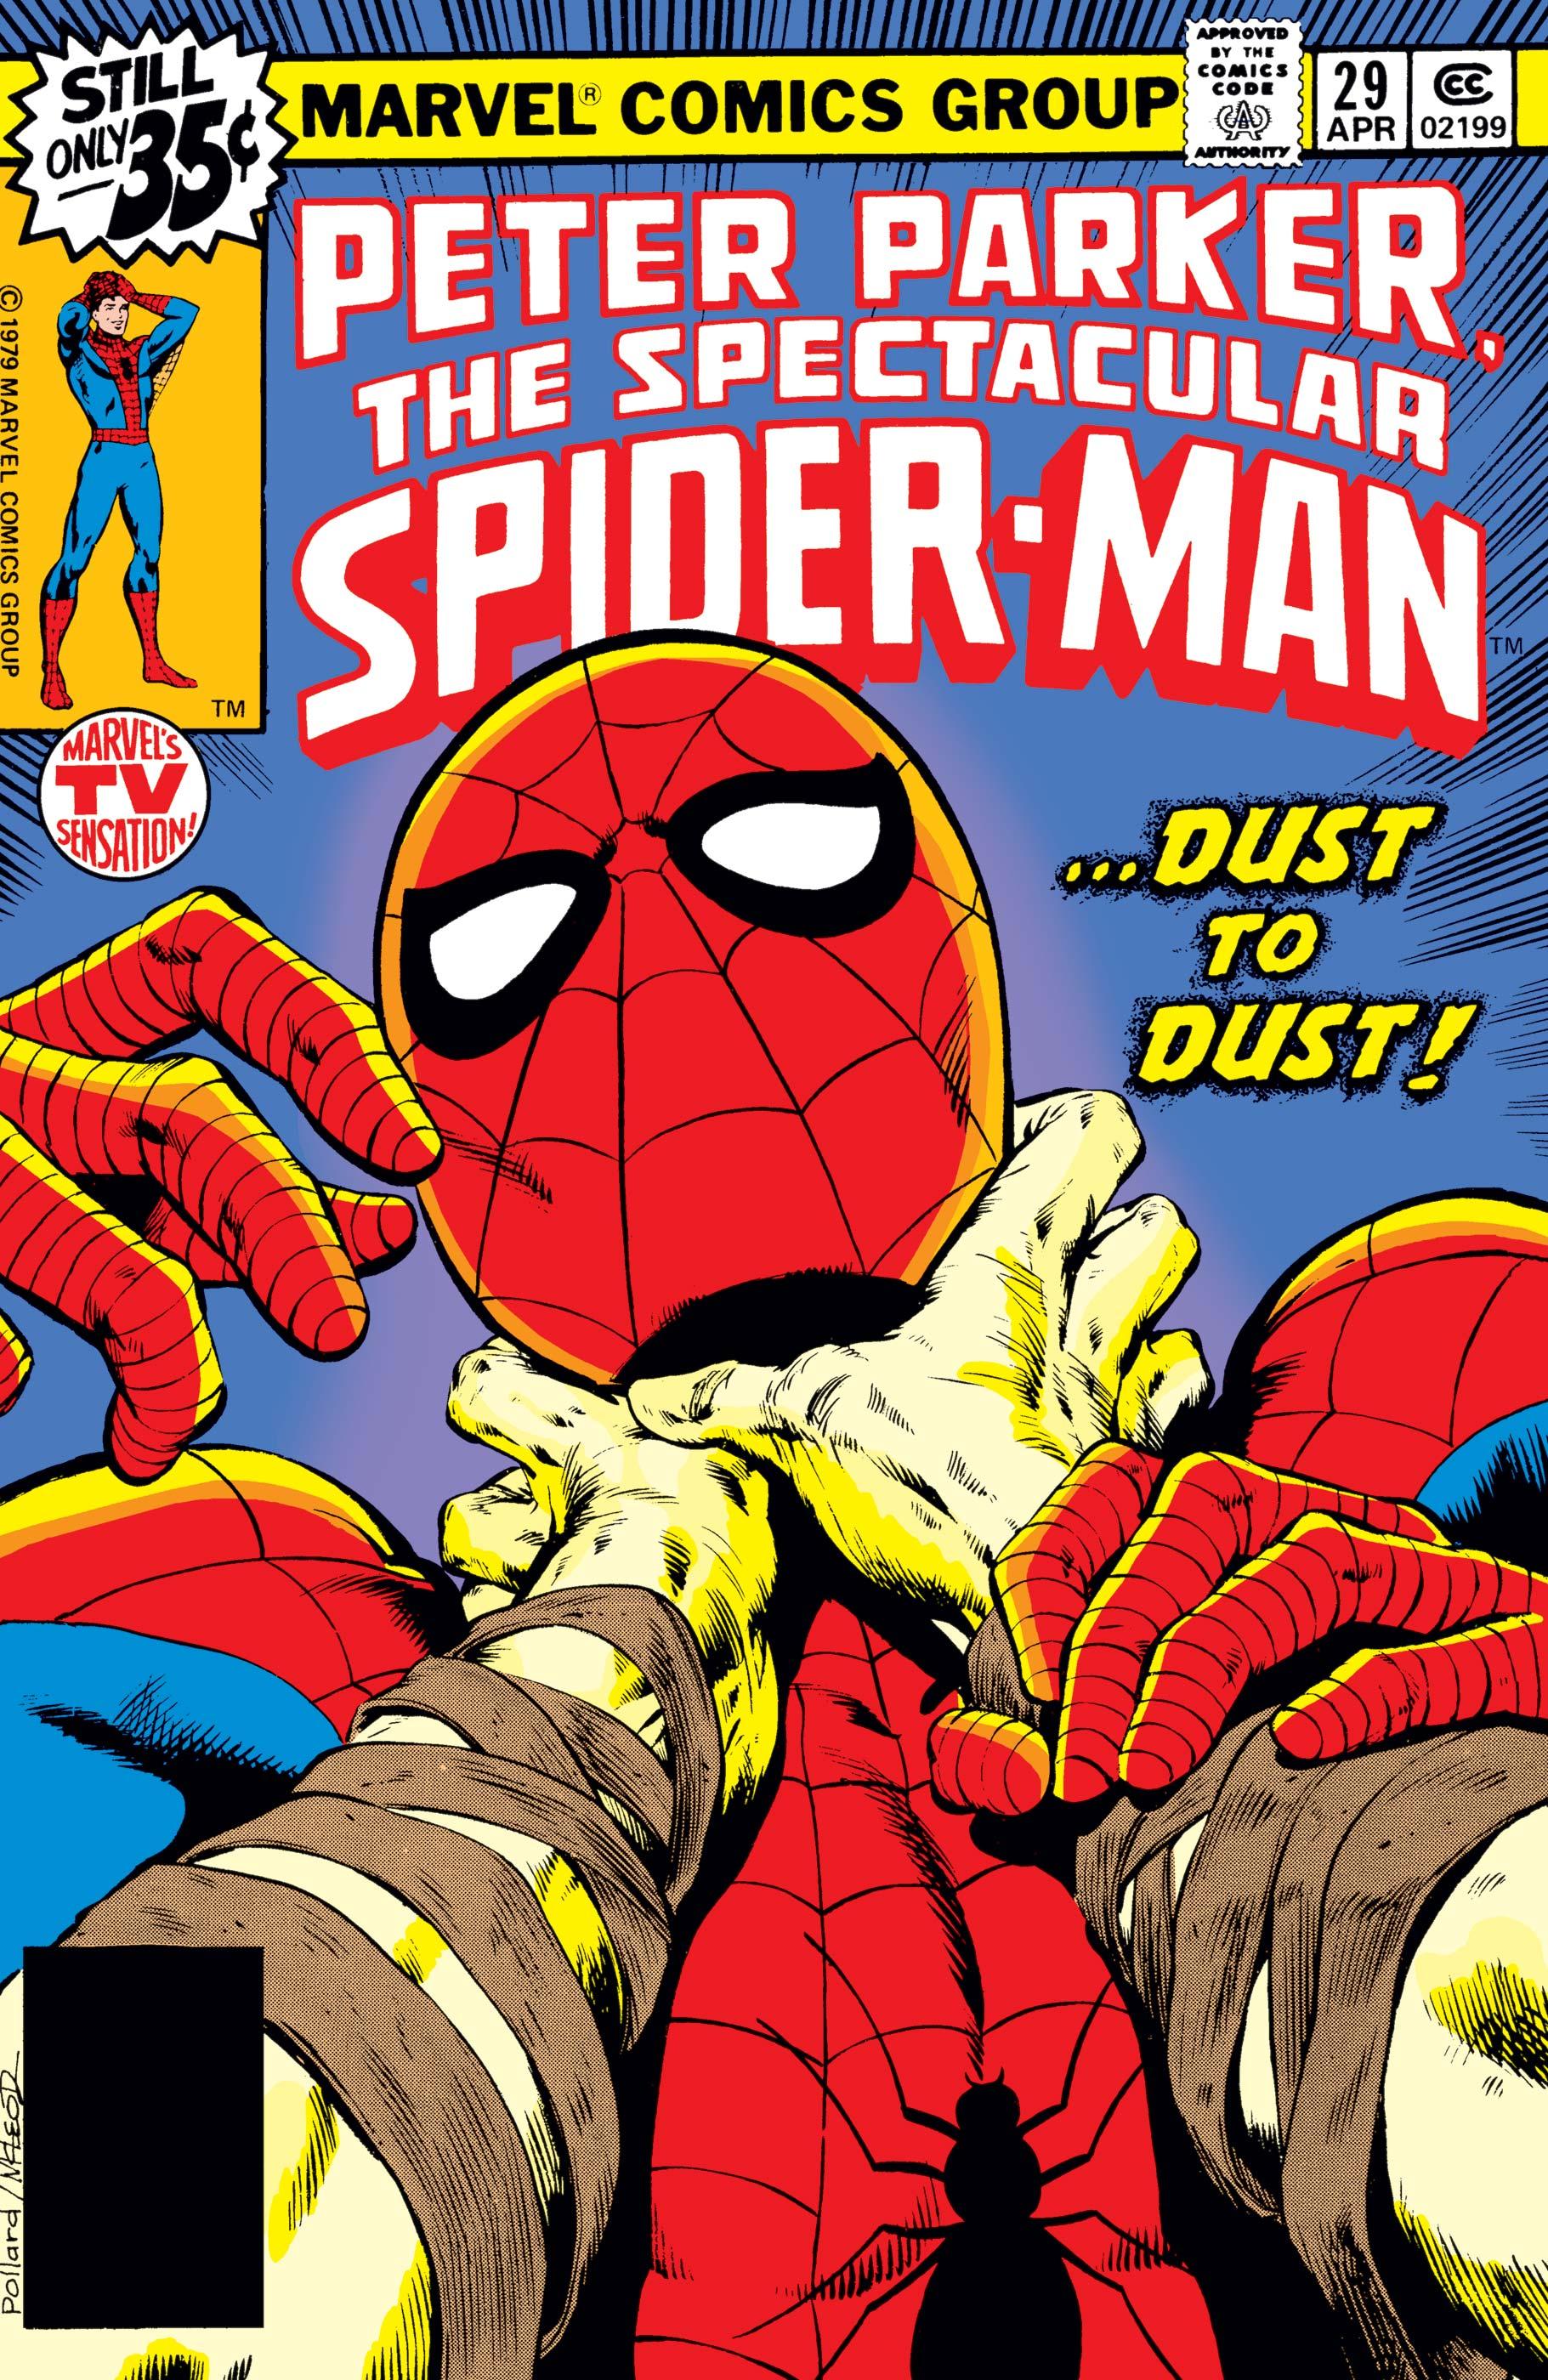 Peter Parker, the Spectacular Spider-Man (1976) #29